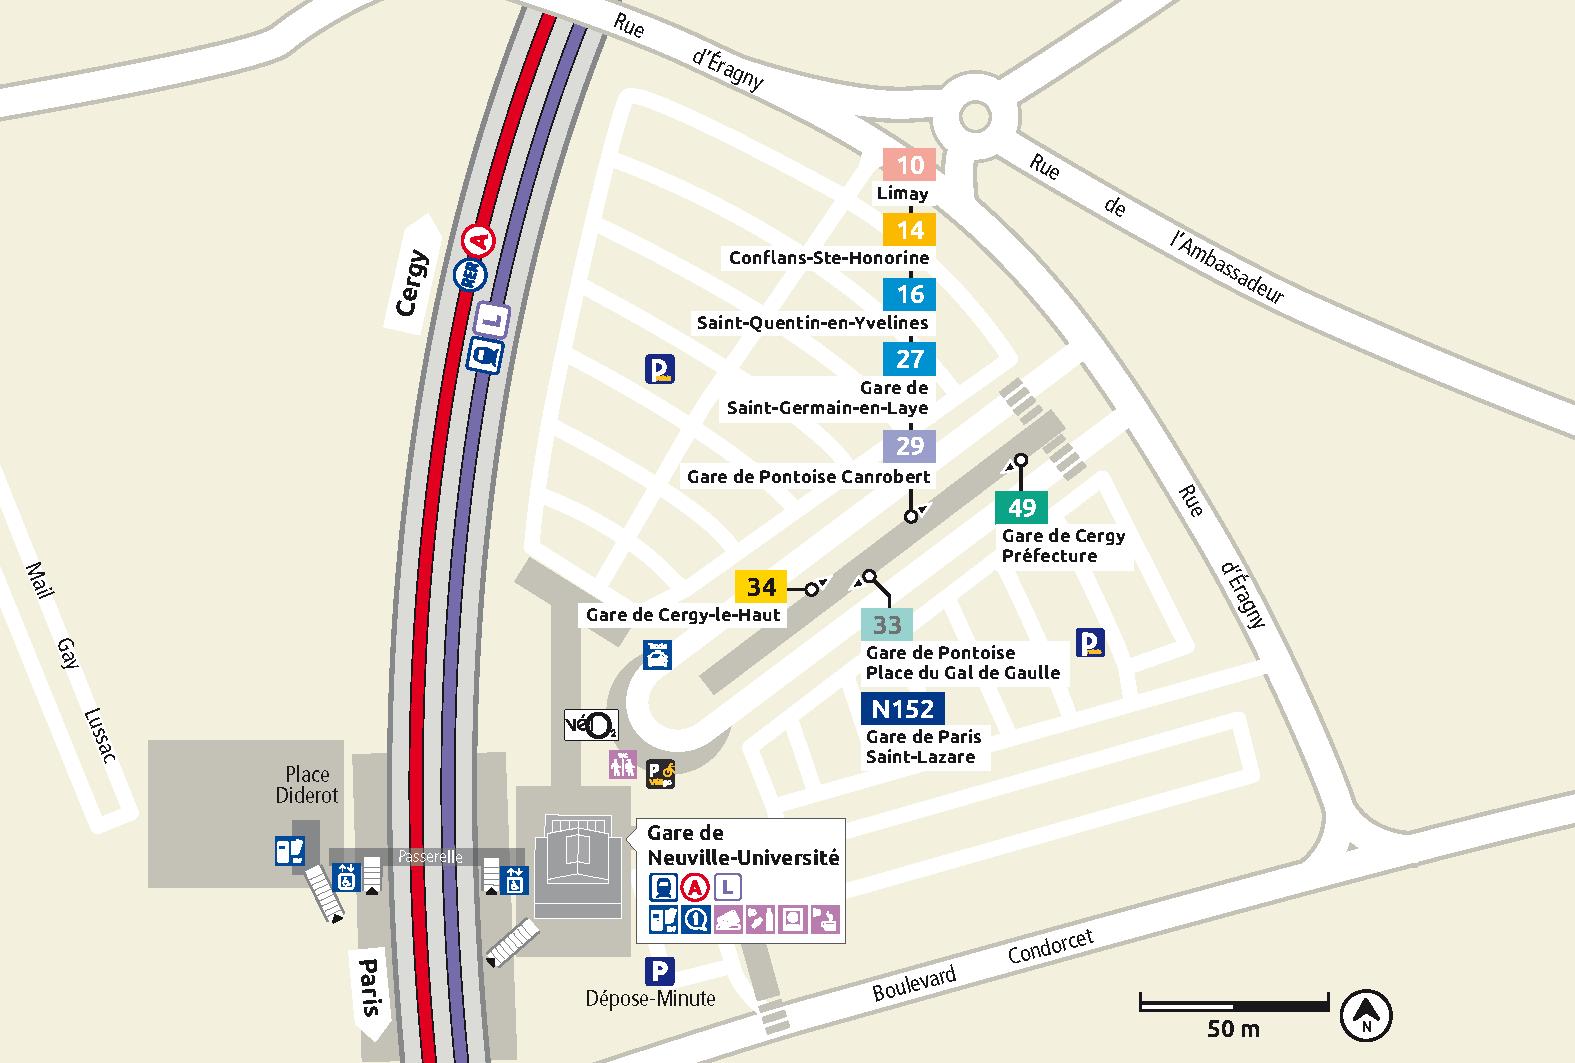 Plan des gares for Piscine cergy prefecture